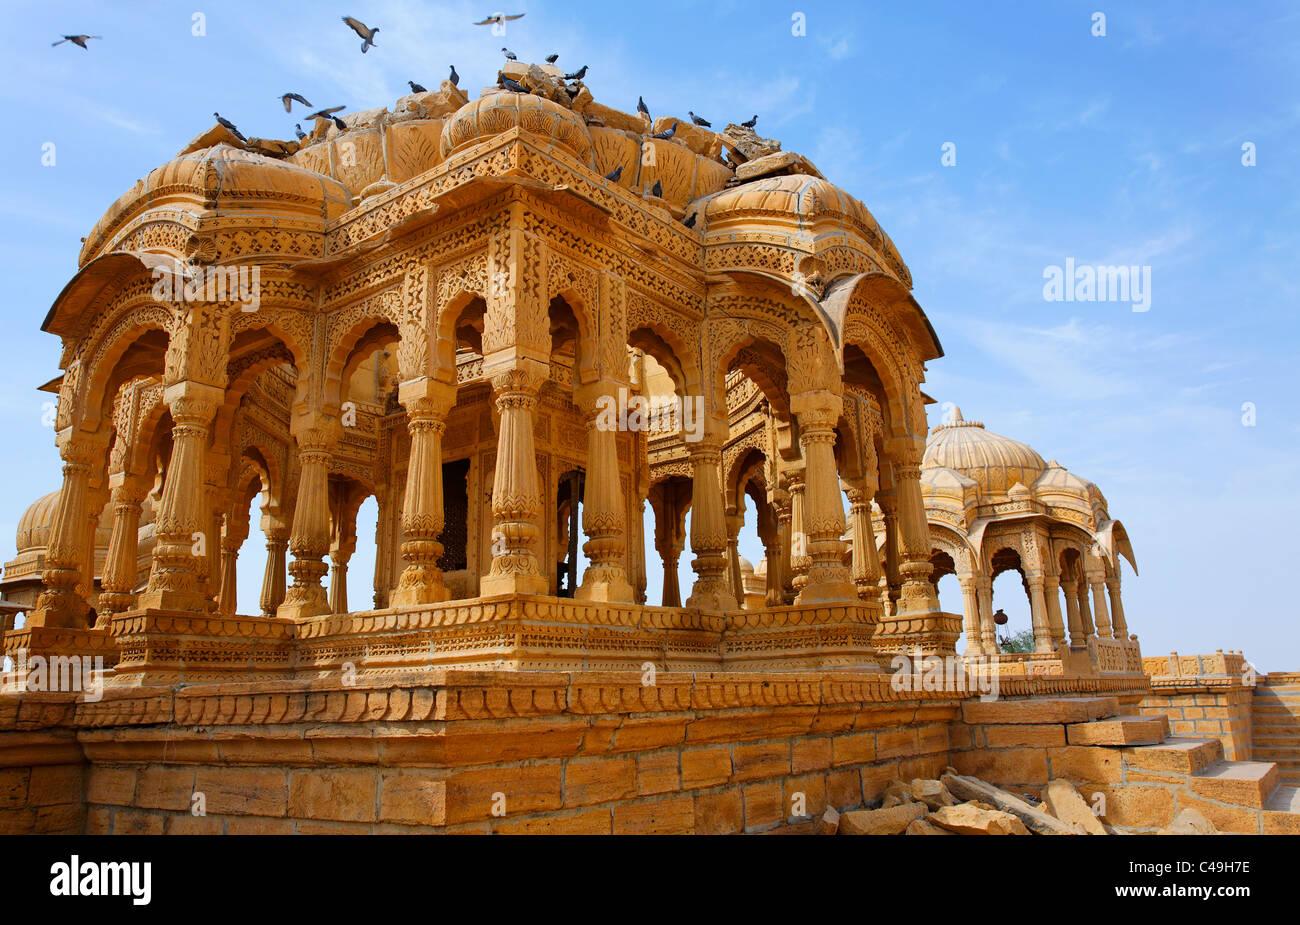 India - Rajasthan - the Royal Cenotaphs near Jaisalmer - Stock Image